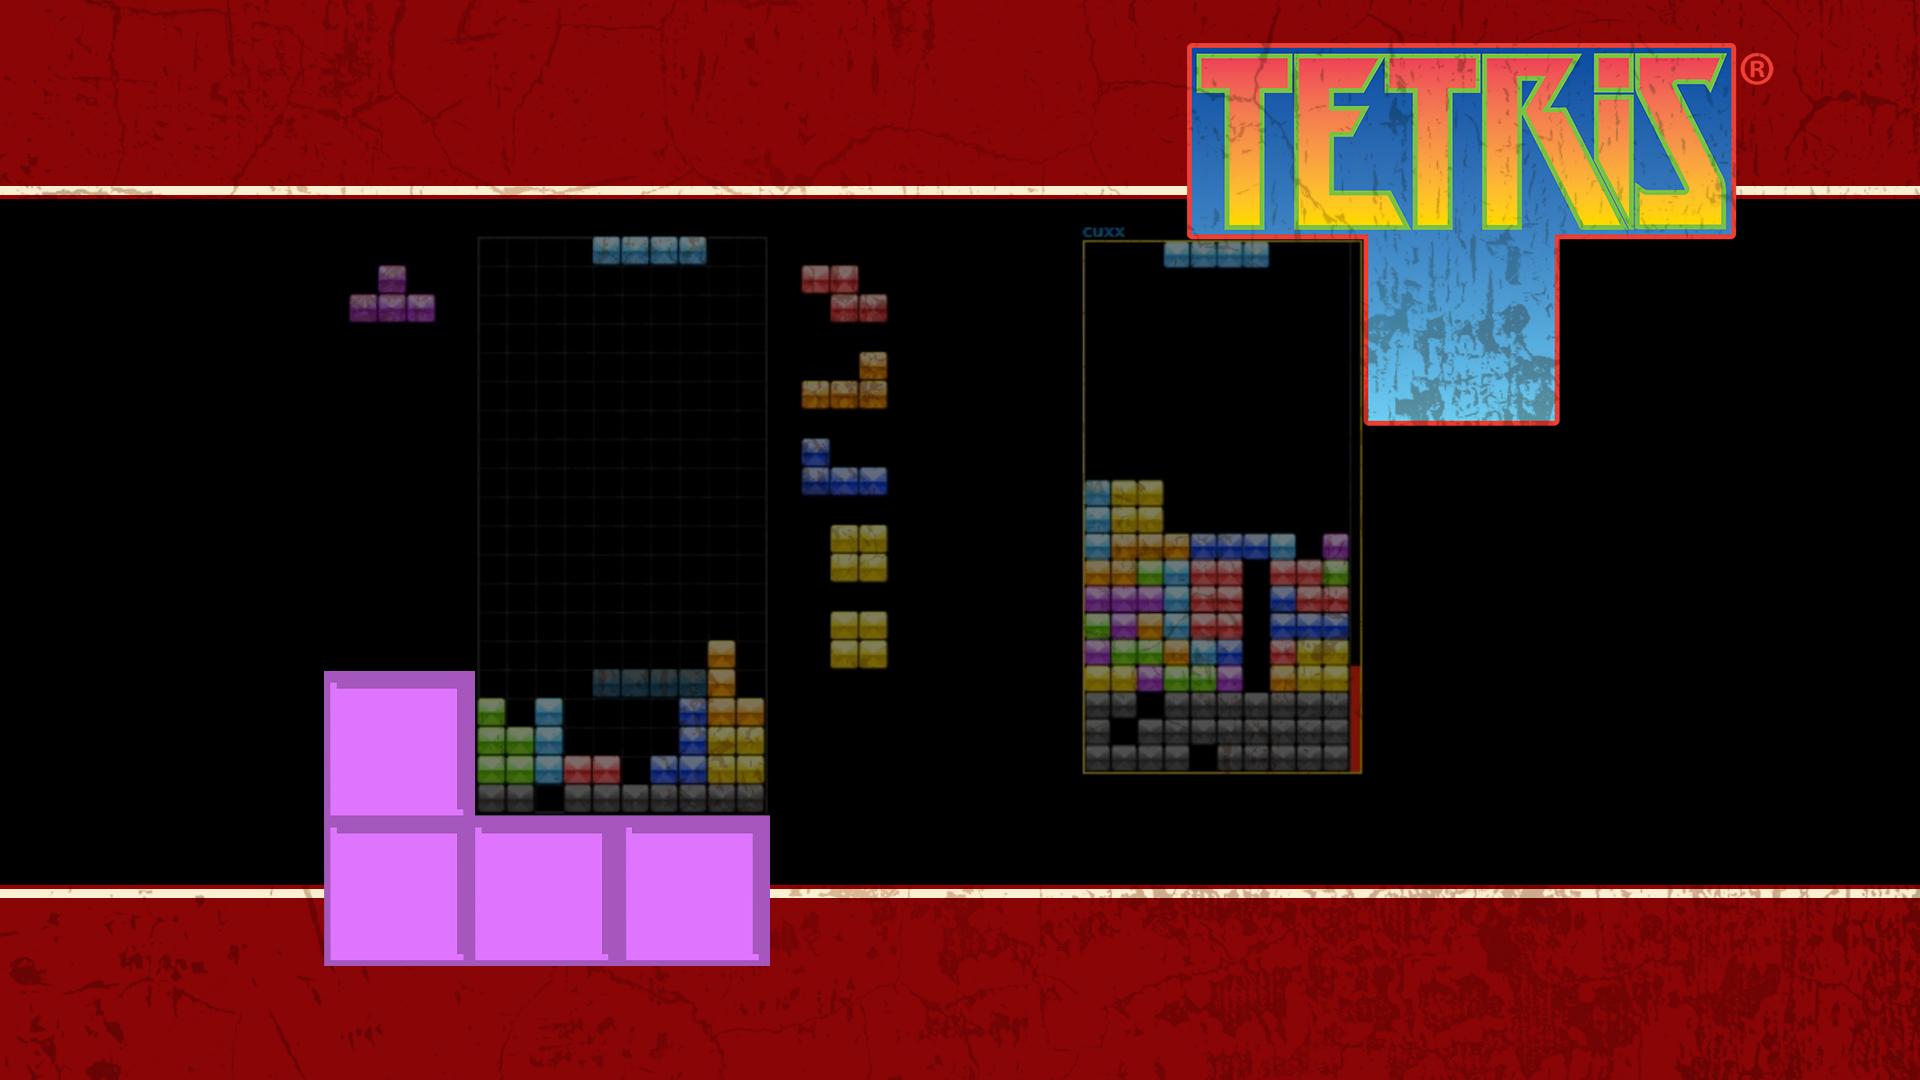 13.00 - Tetris